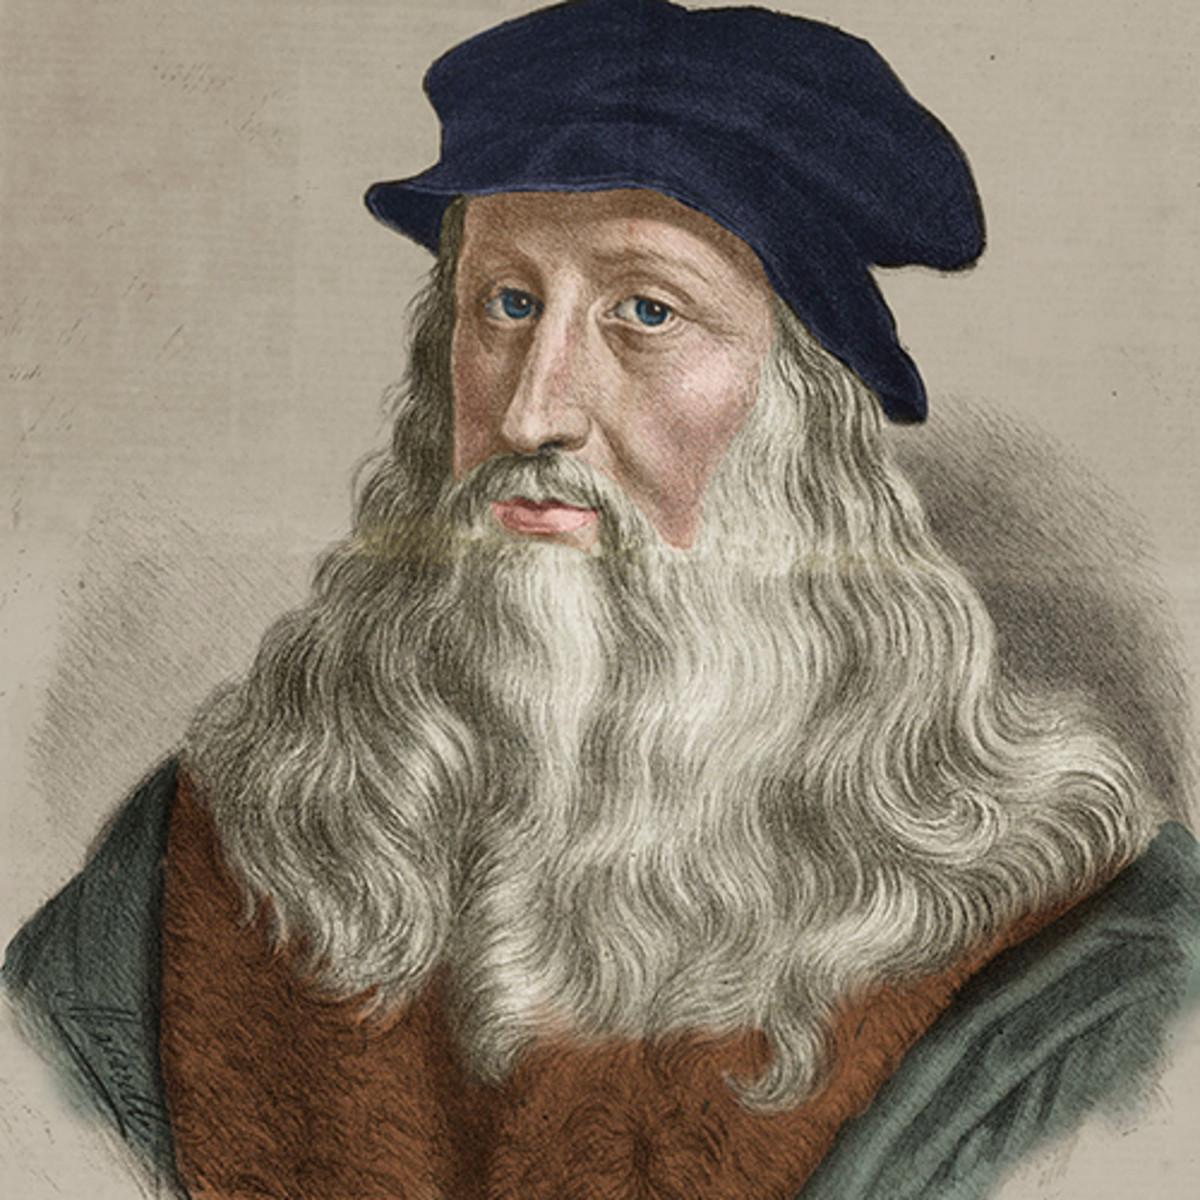 LGBTQ+ Inventors - Leonardo da Vinci